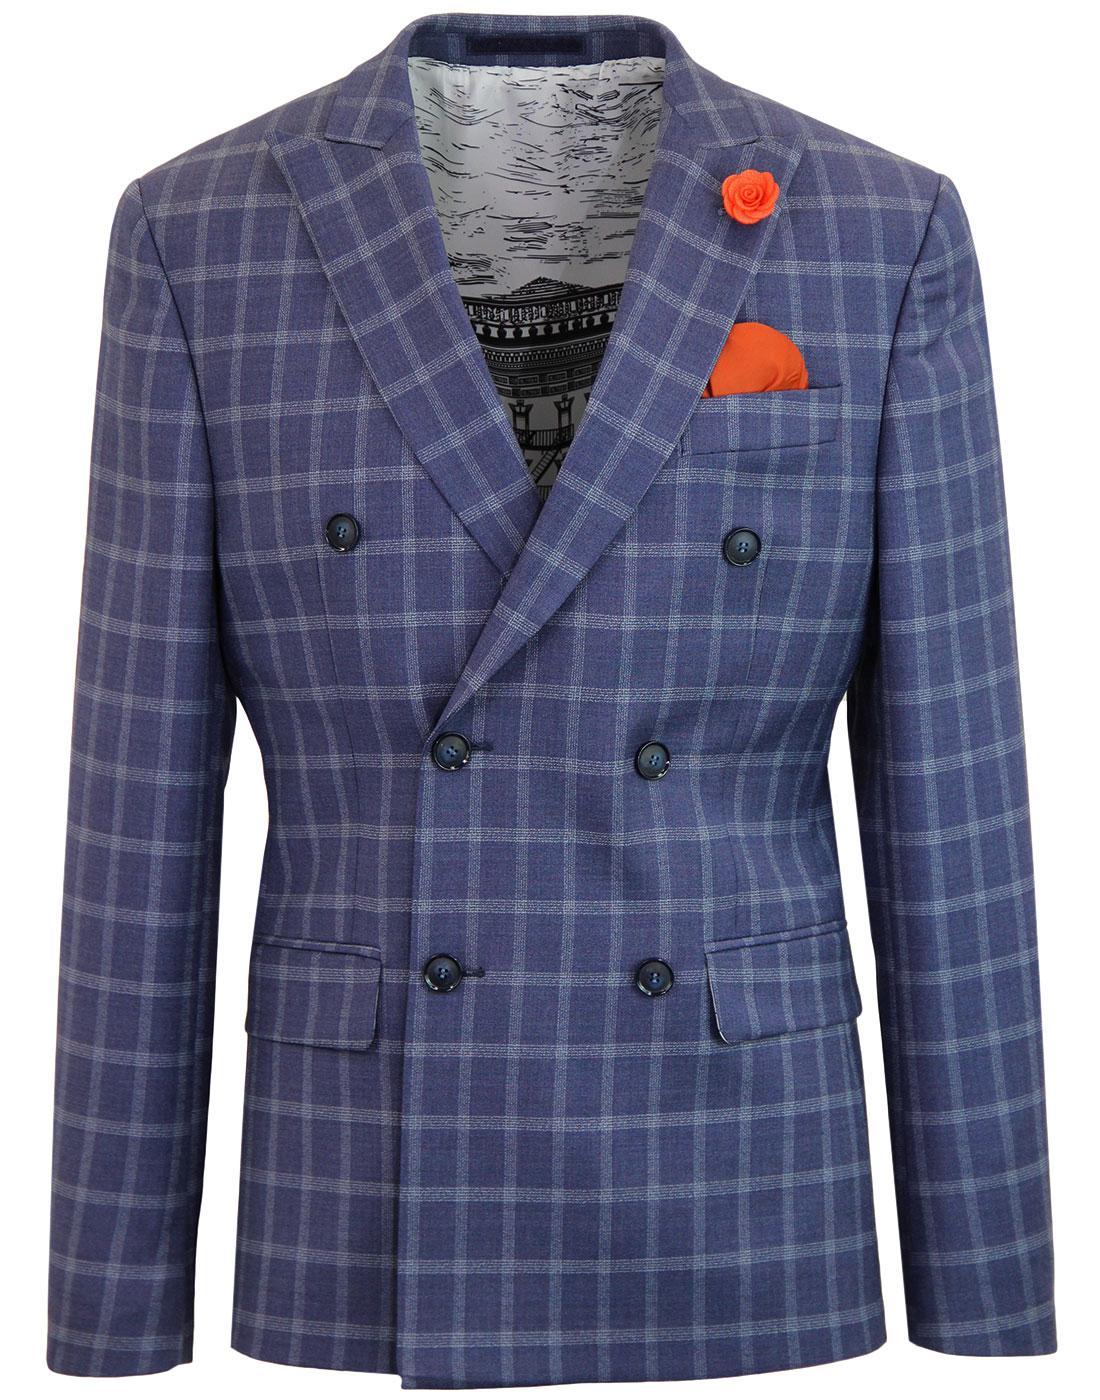 Men's Retro Mod Check Double Breasted Suit Blazer